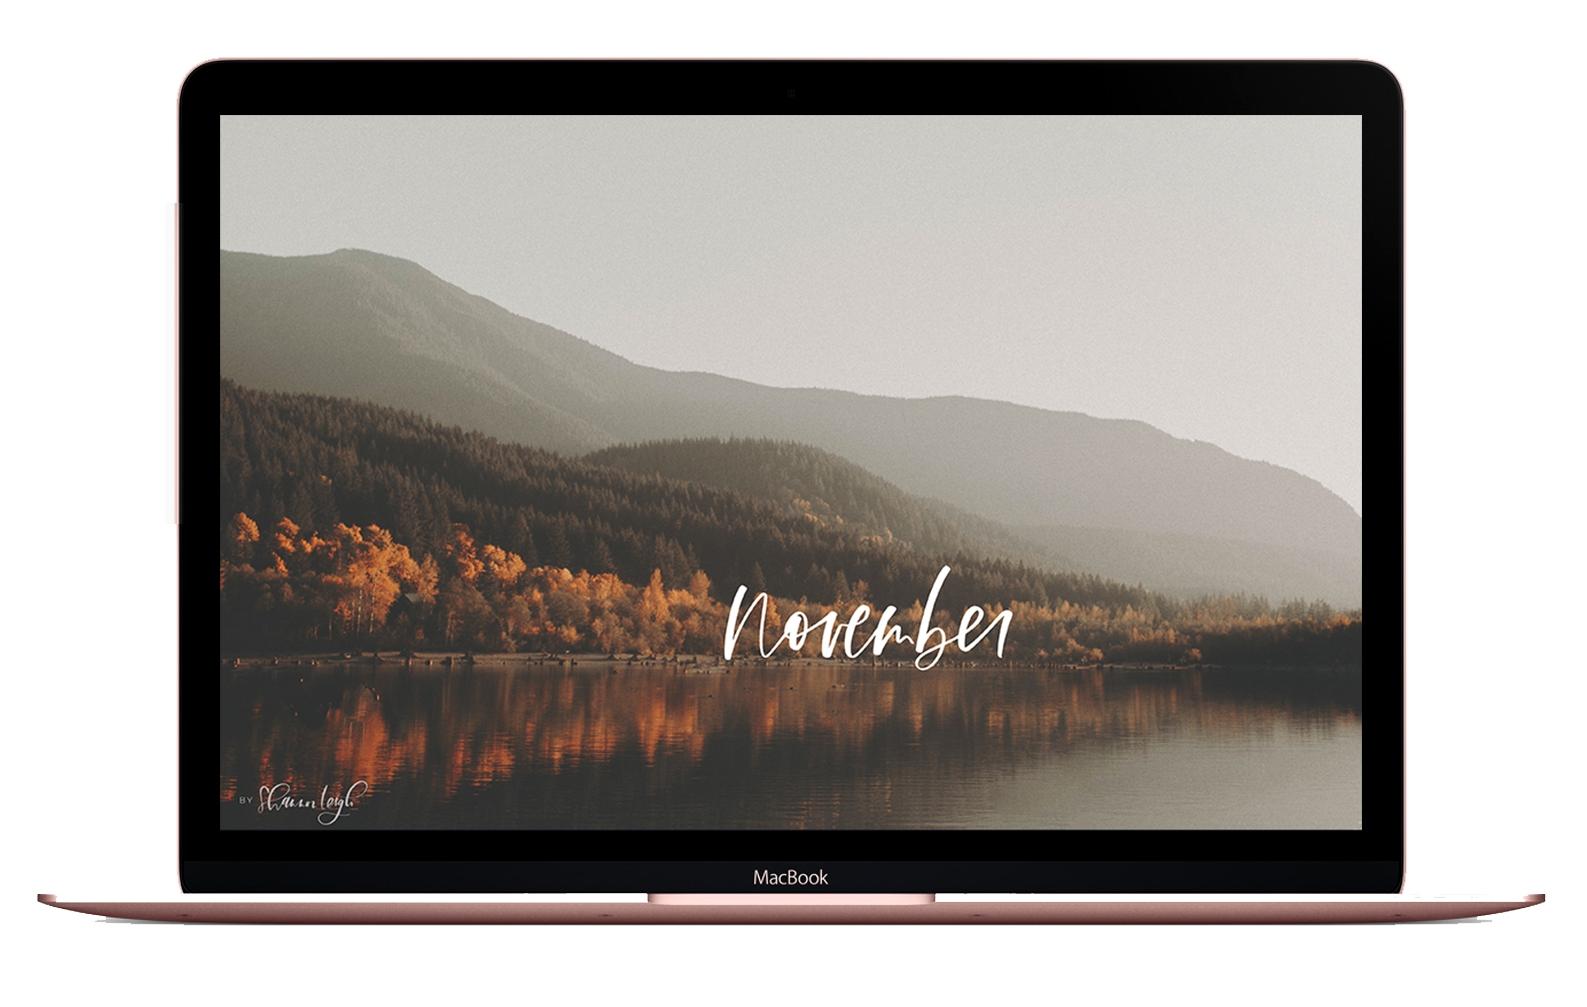 Rose-Gold-MacBook-Mockup-Free (2).jpg